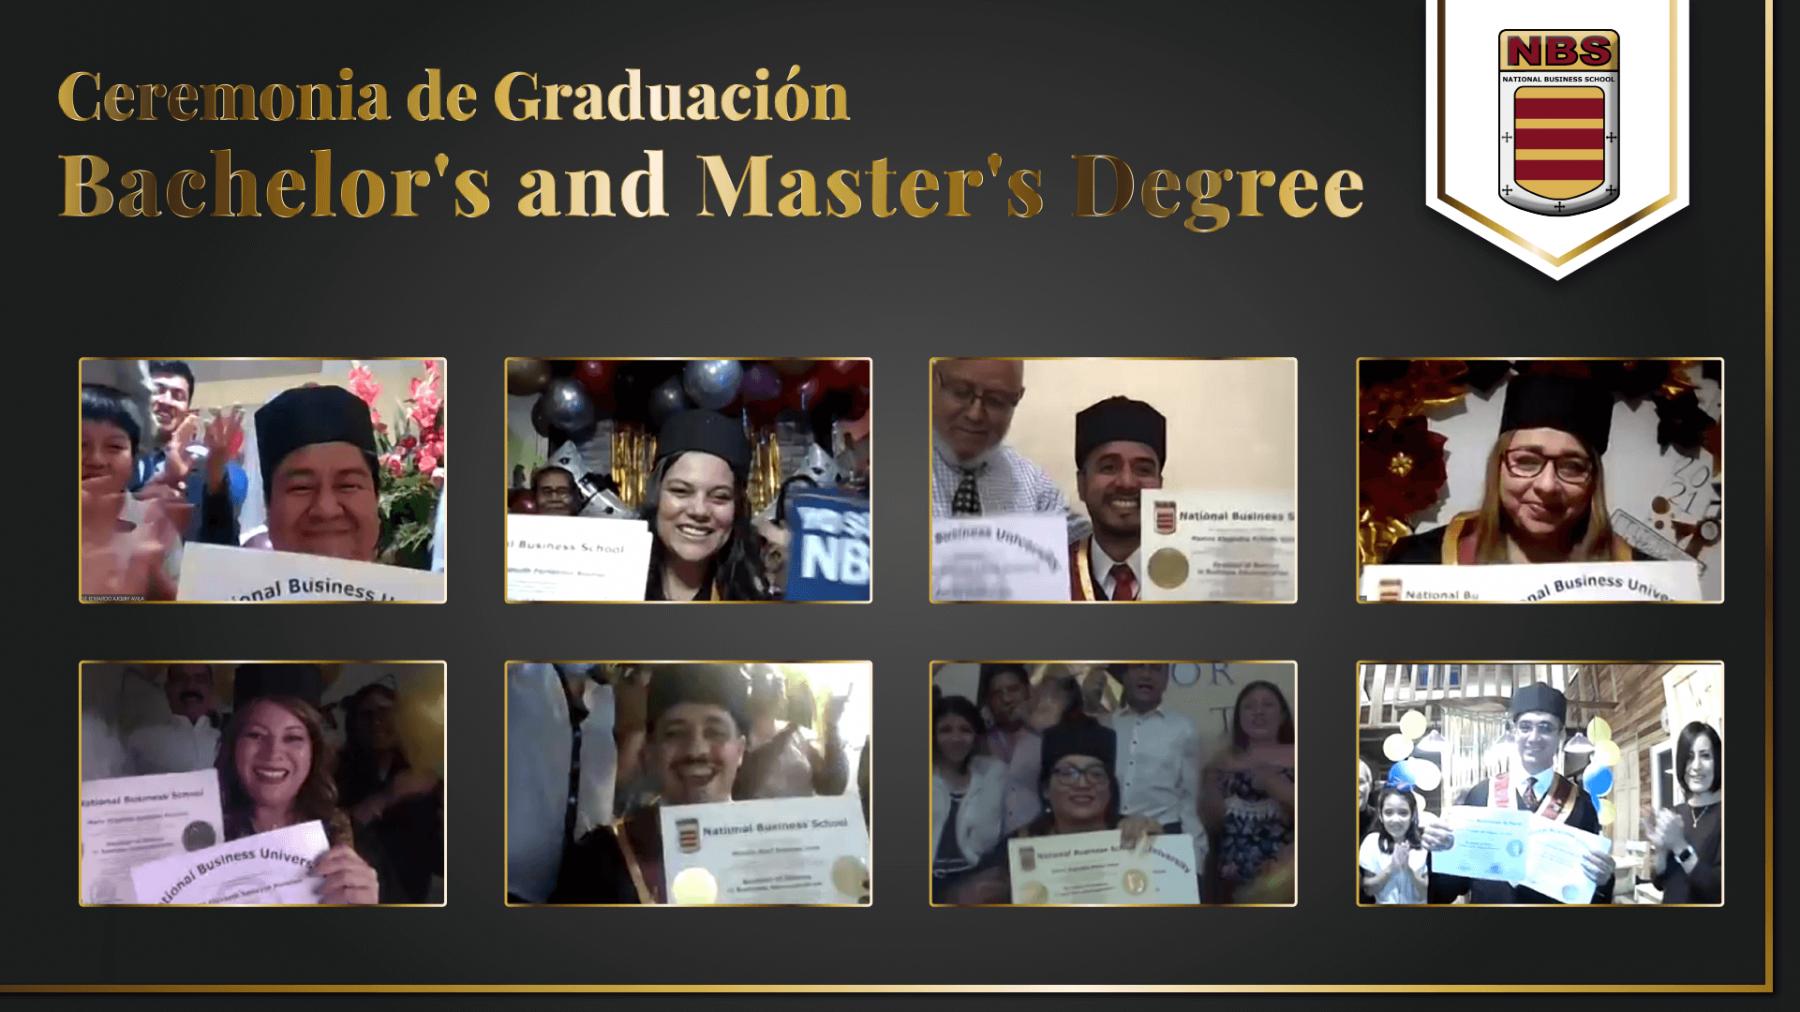 GraduacionBACHMA_NBS_